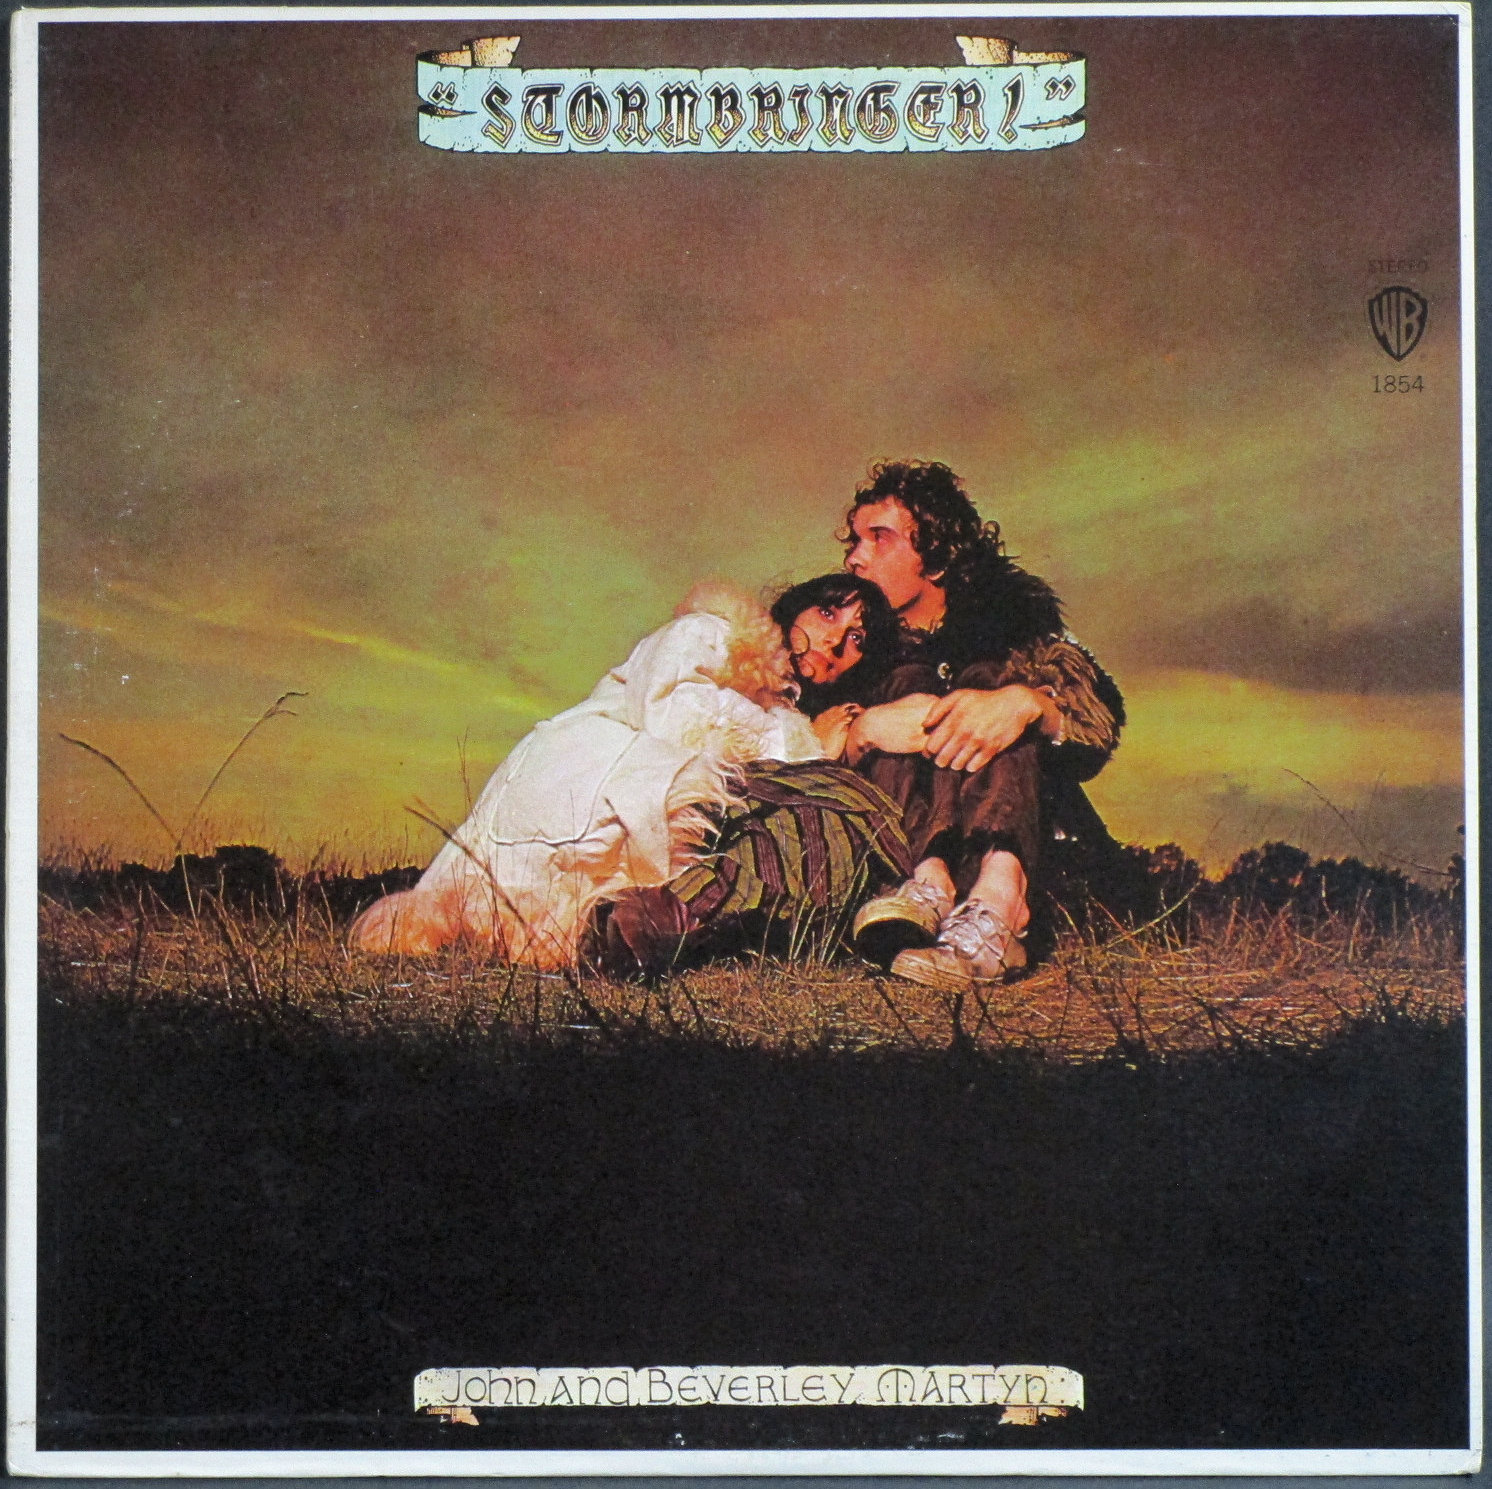 John And Beverley Martyn ジョン & ビバリー・マーティン /  Stormbringer! ストームブリンガー!   WLP